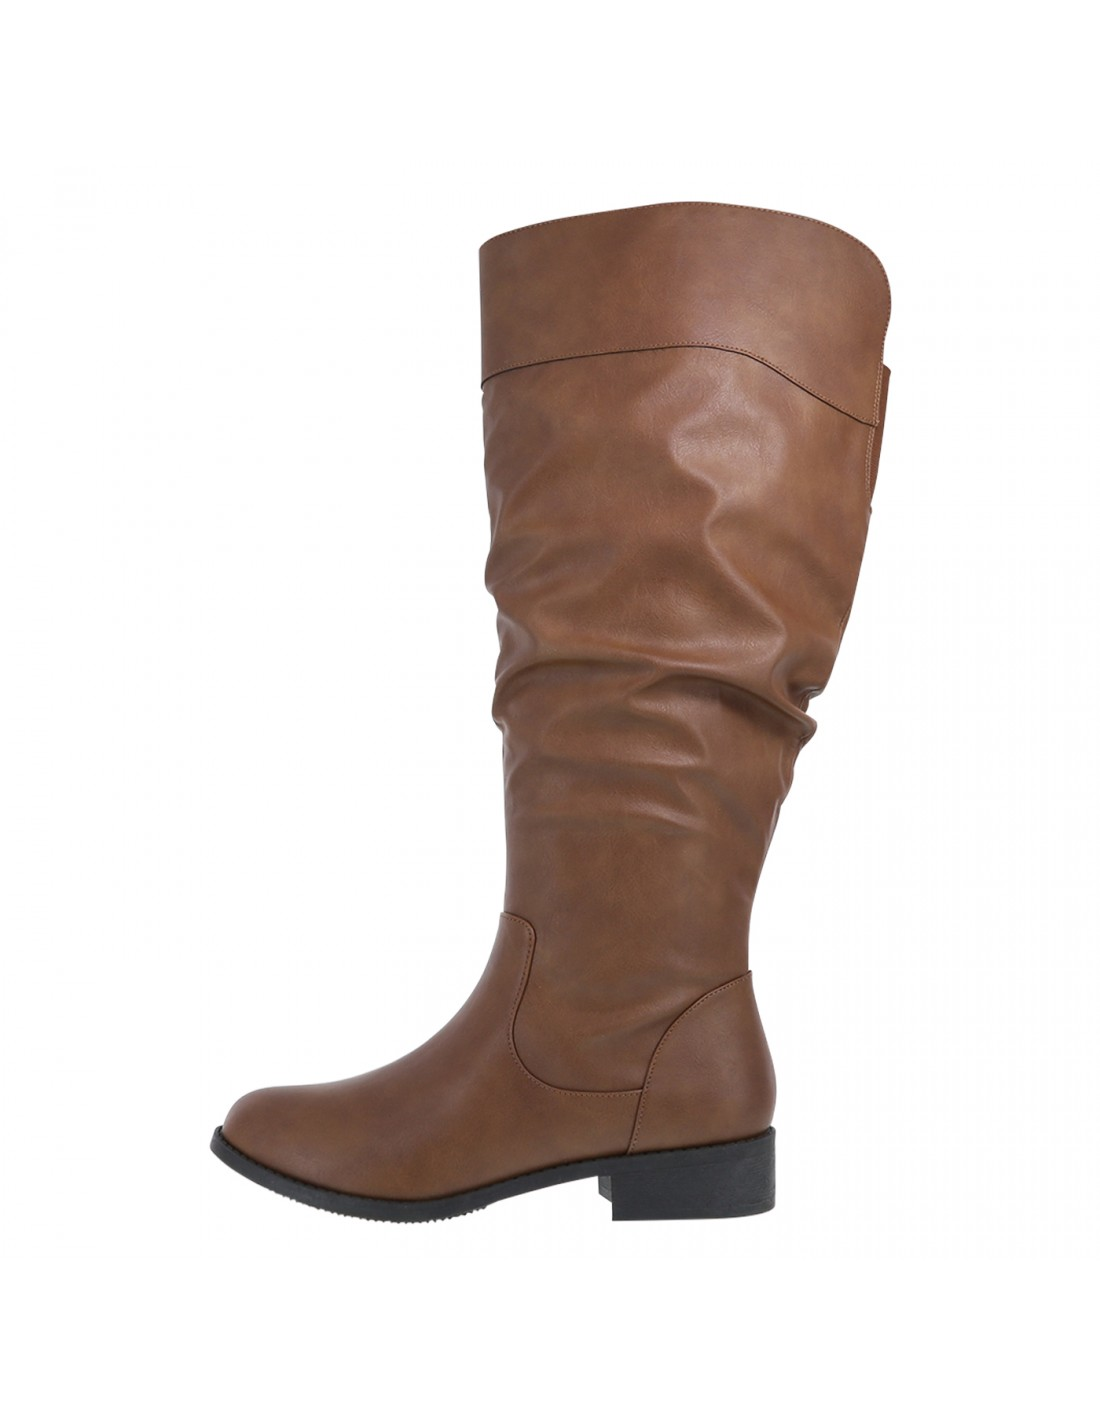 9f29be0c2f3 American Eagle Tina Women s Boot